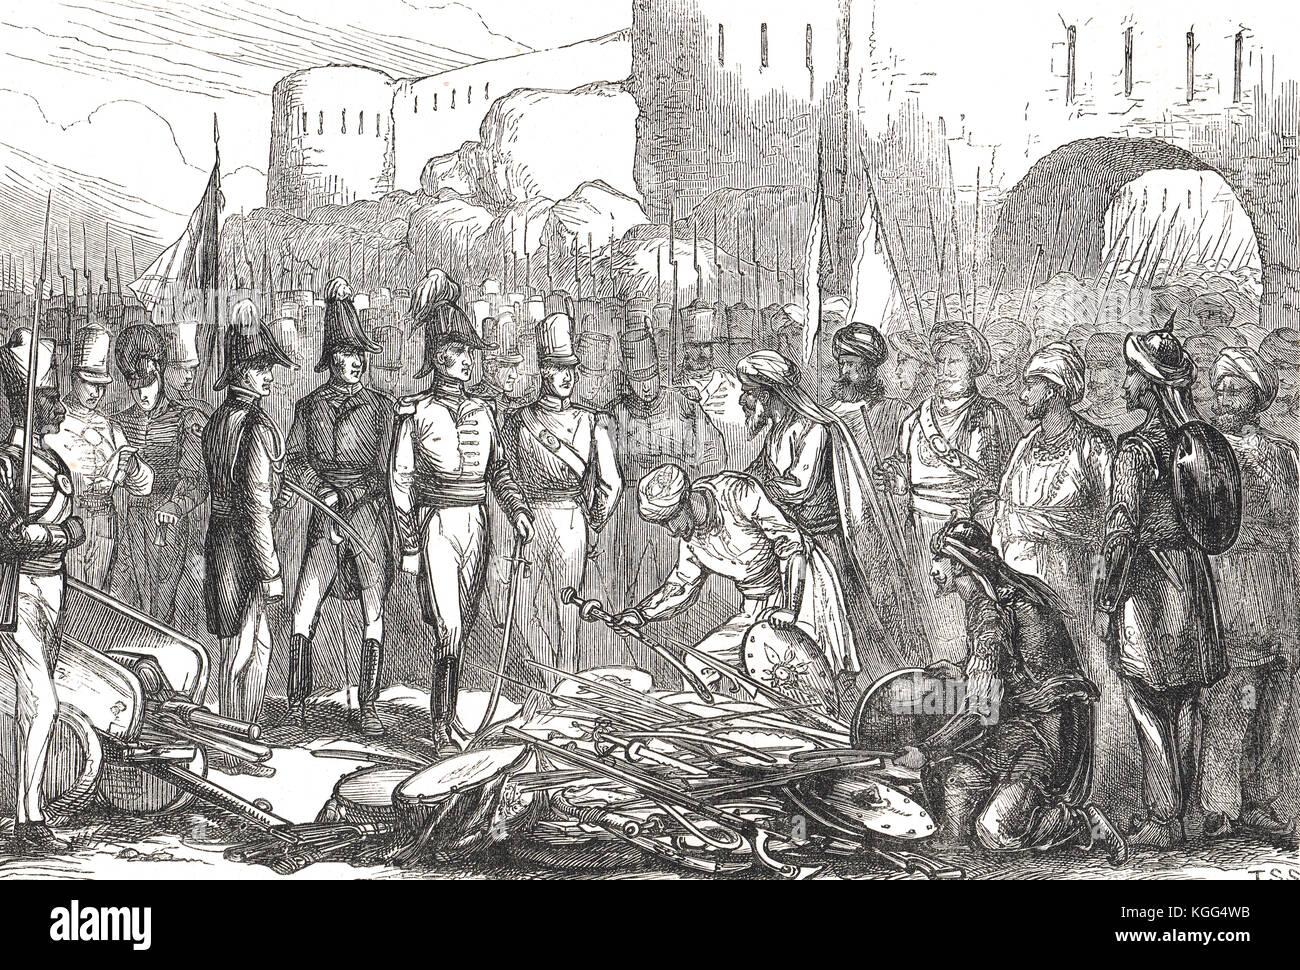 Surrender of Asirgarh (Asseerghur) fort, 9 April 1819